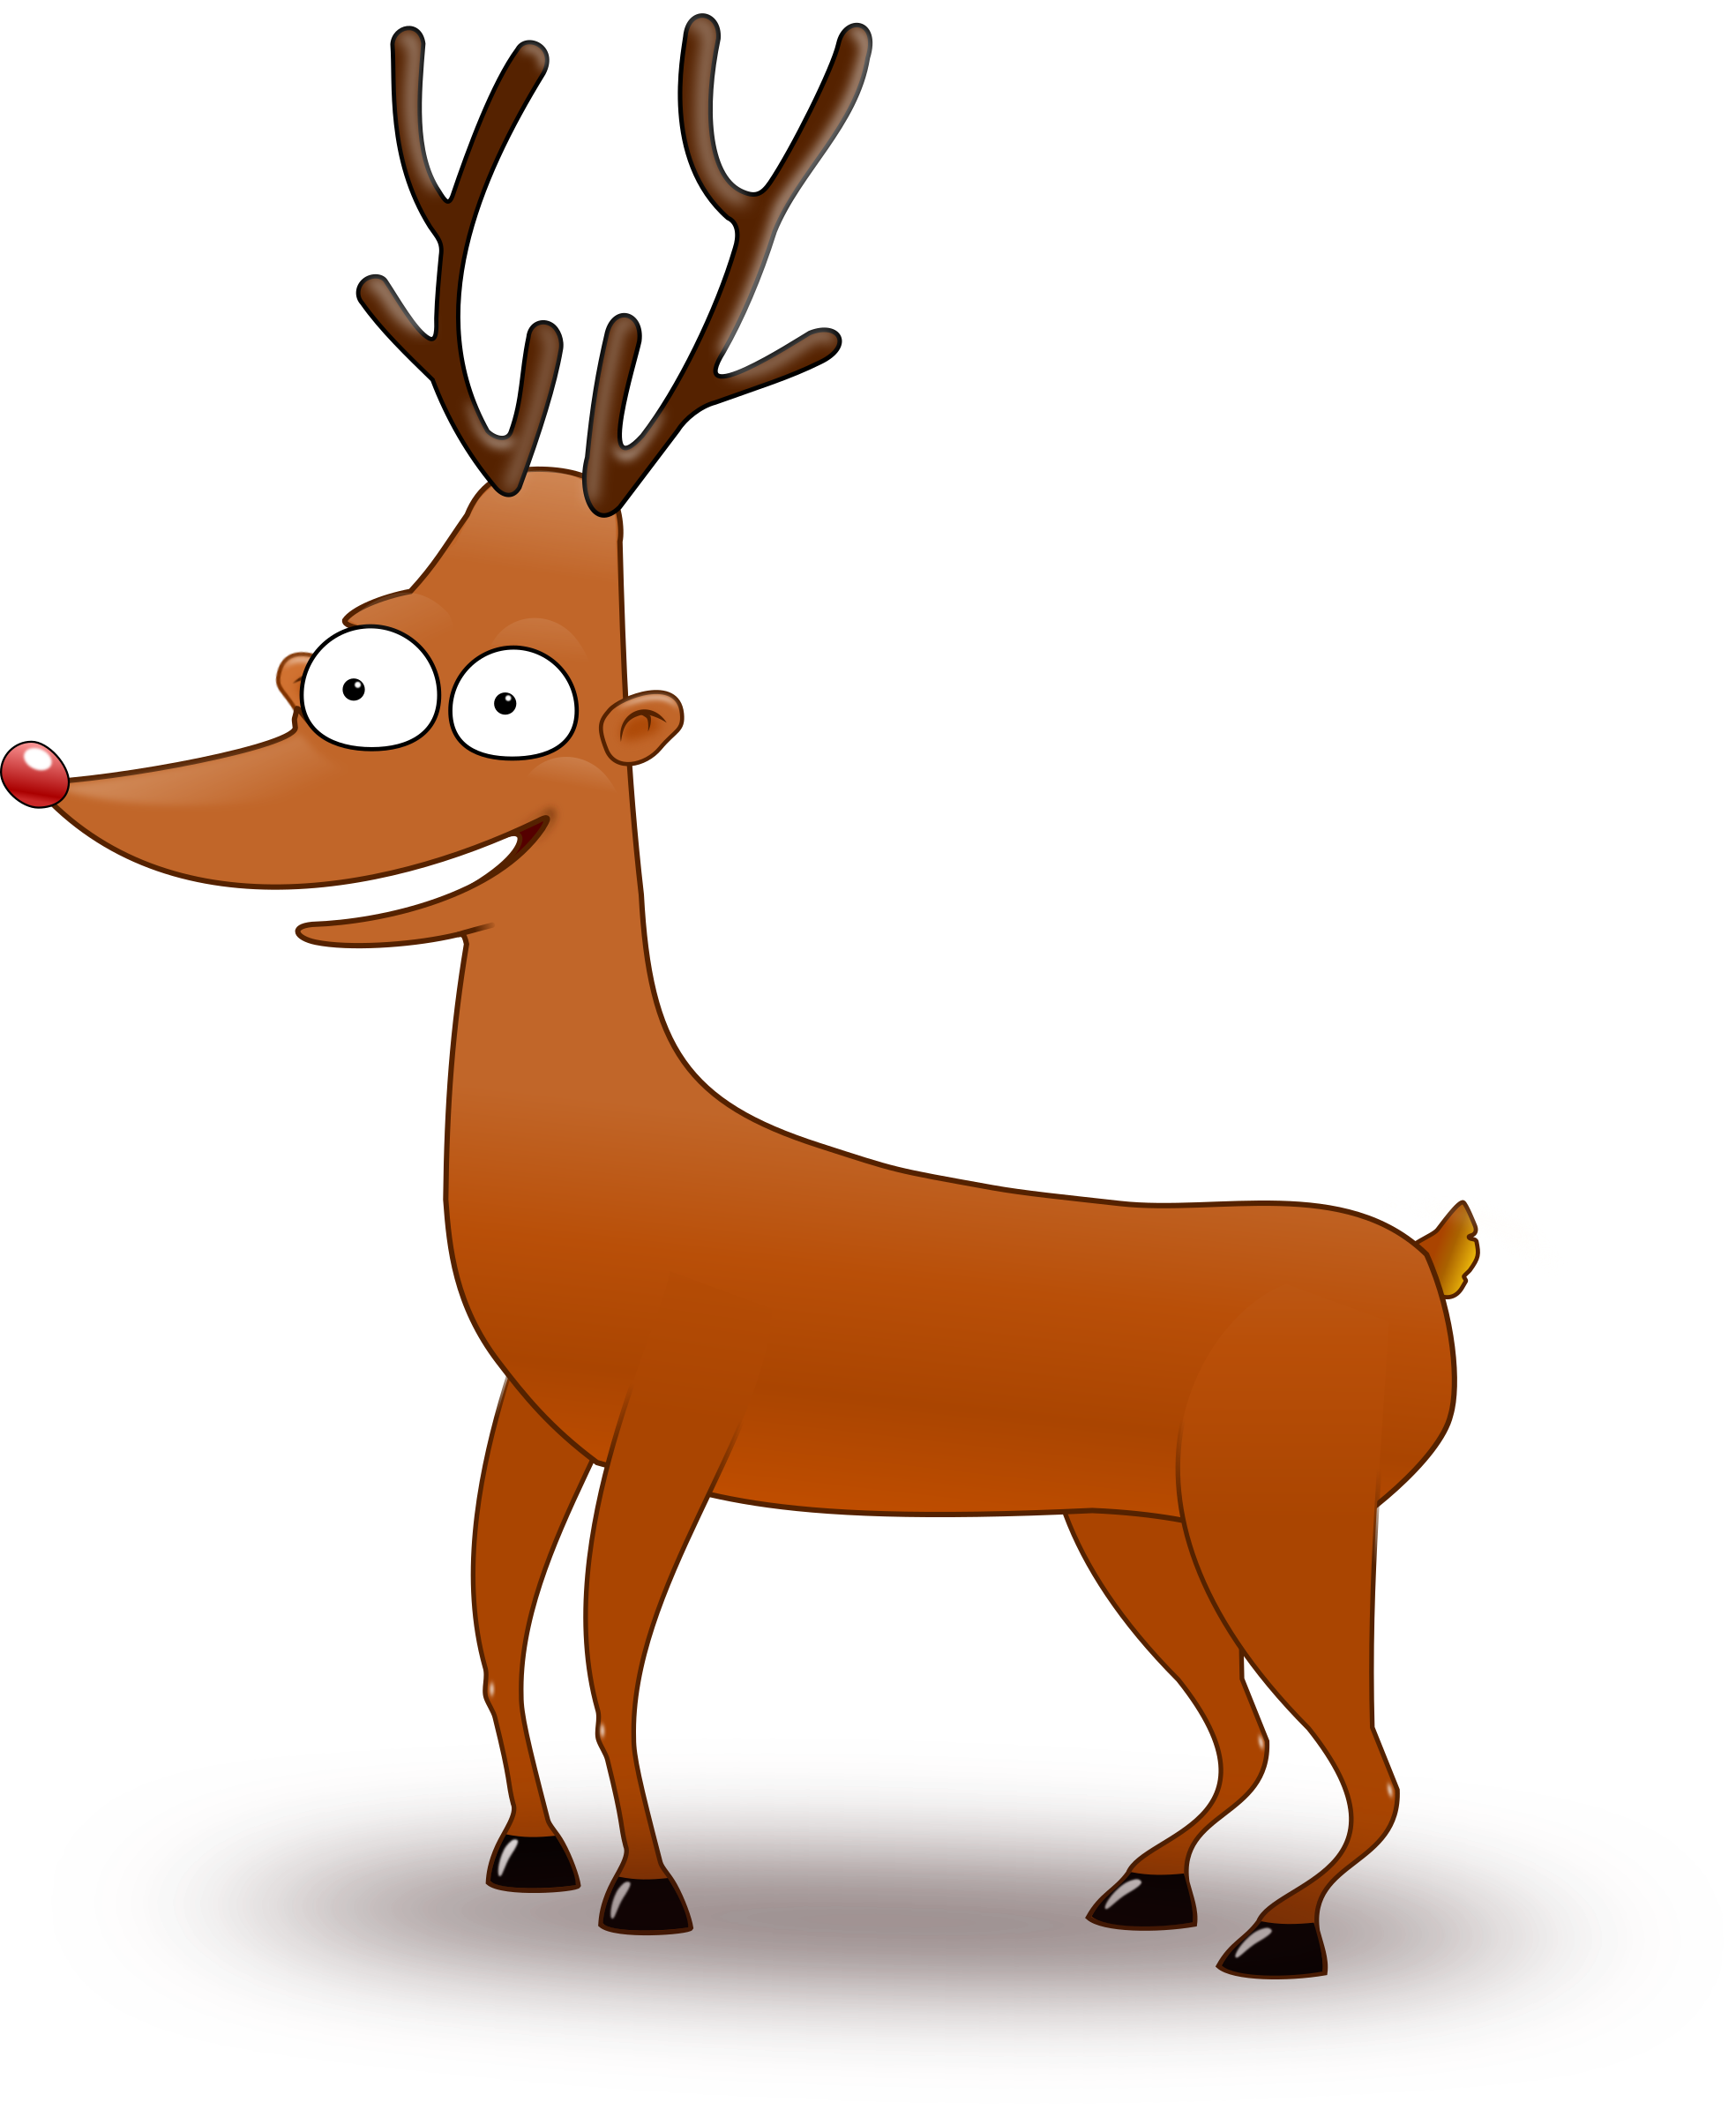 With big eyes image. Clipart reindeer reinder